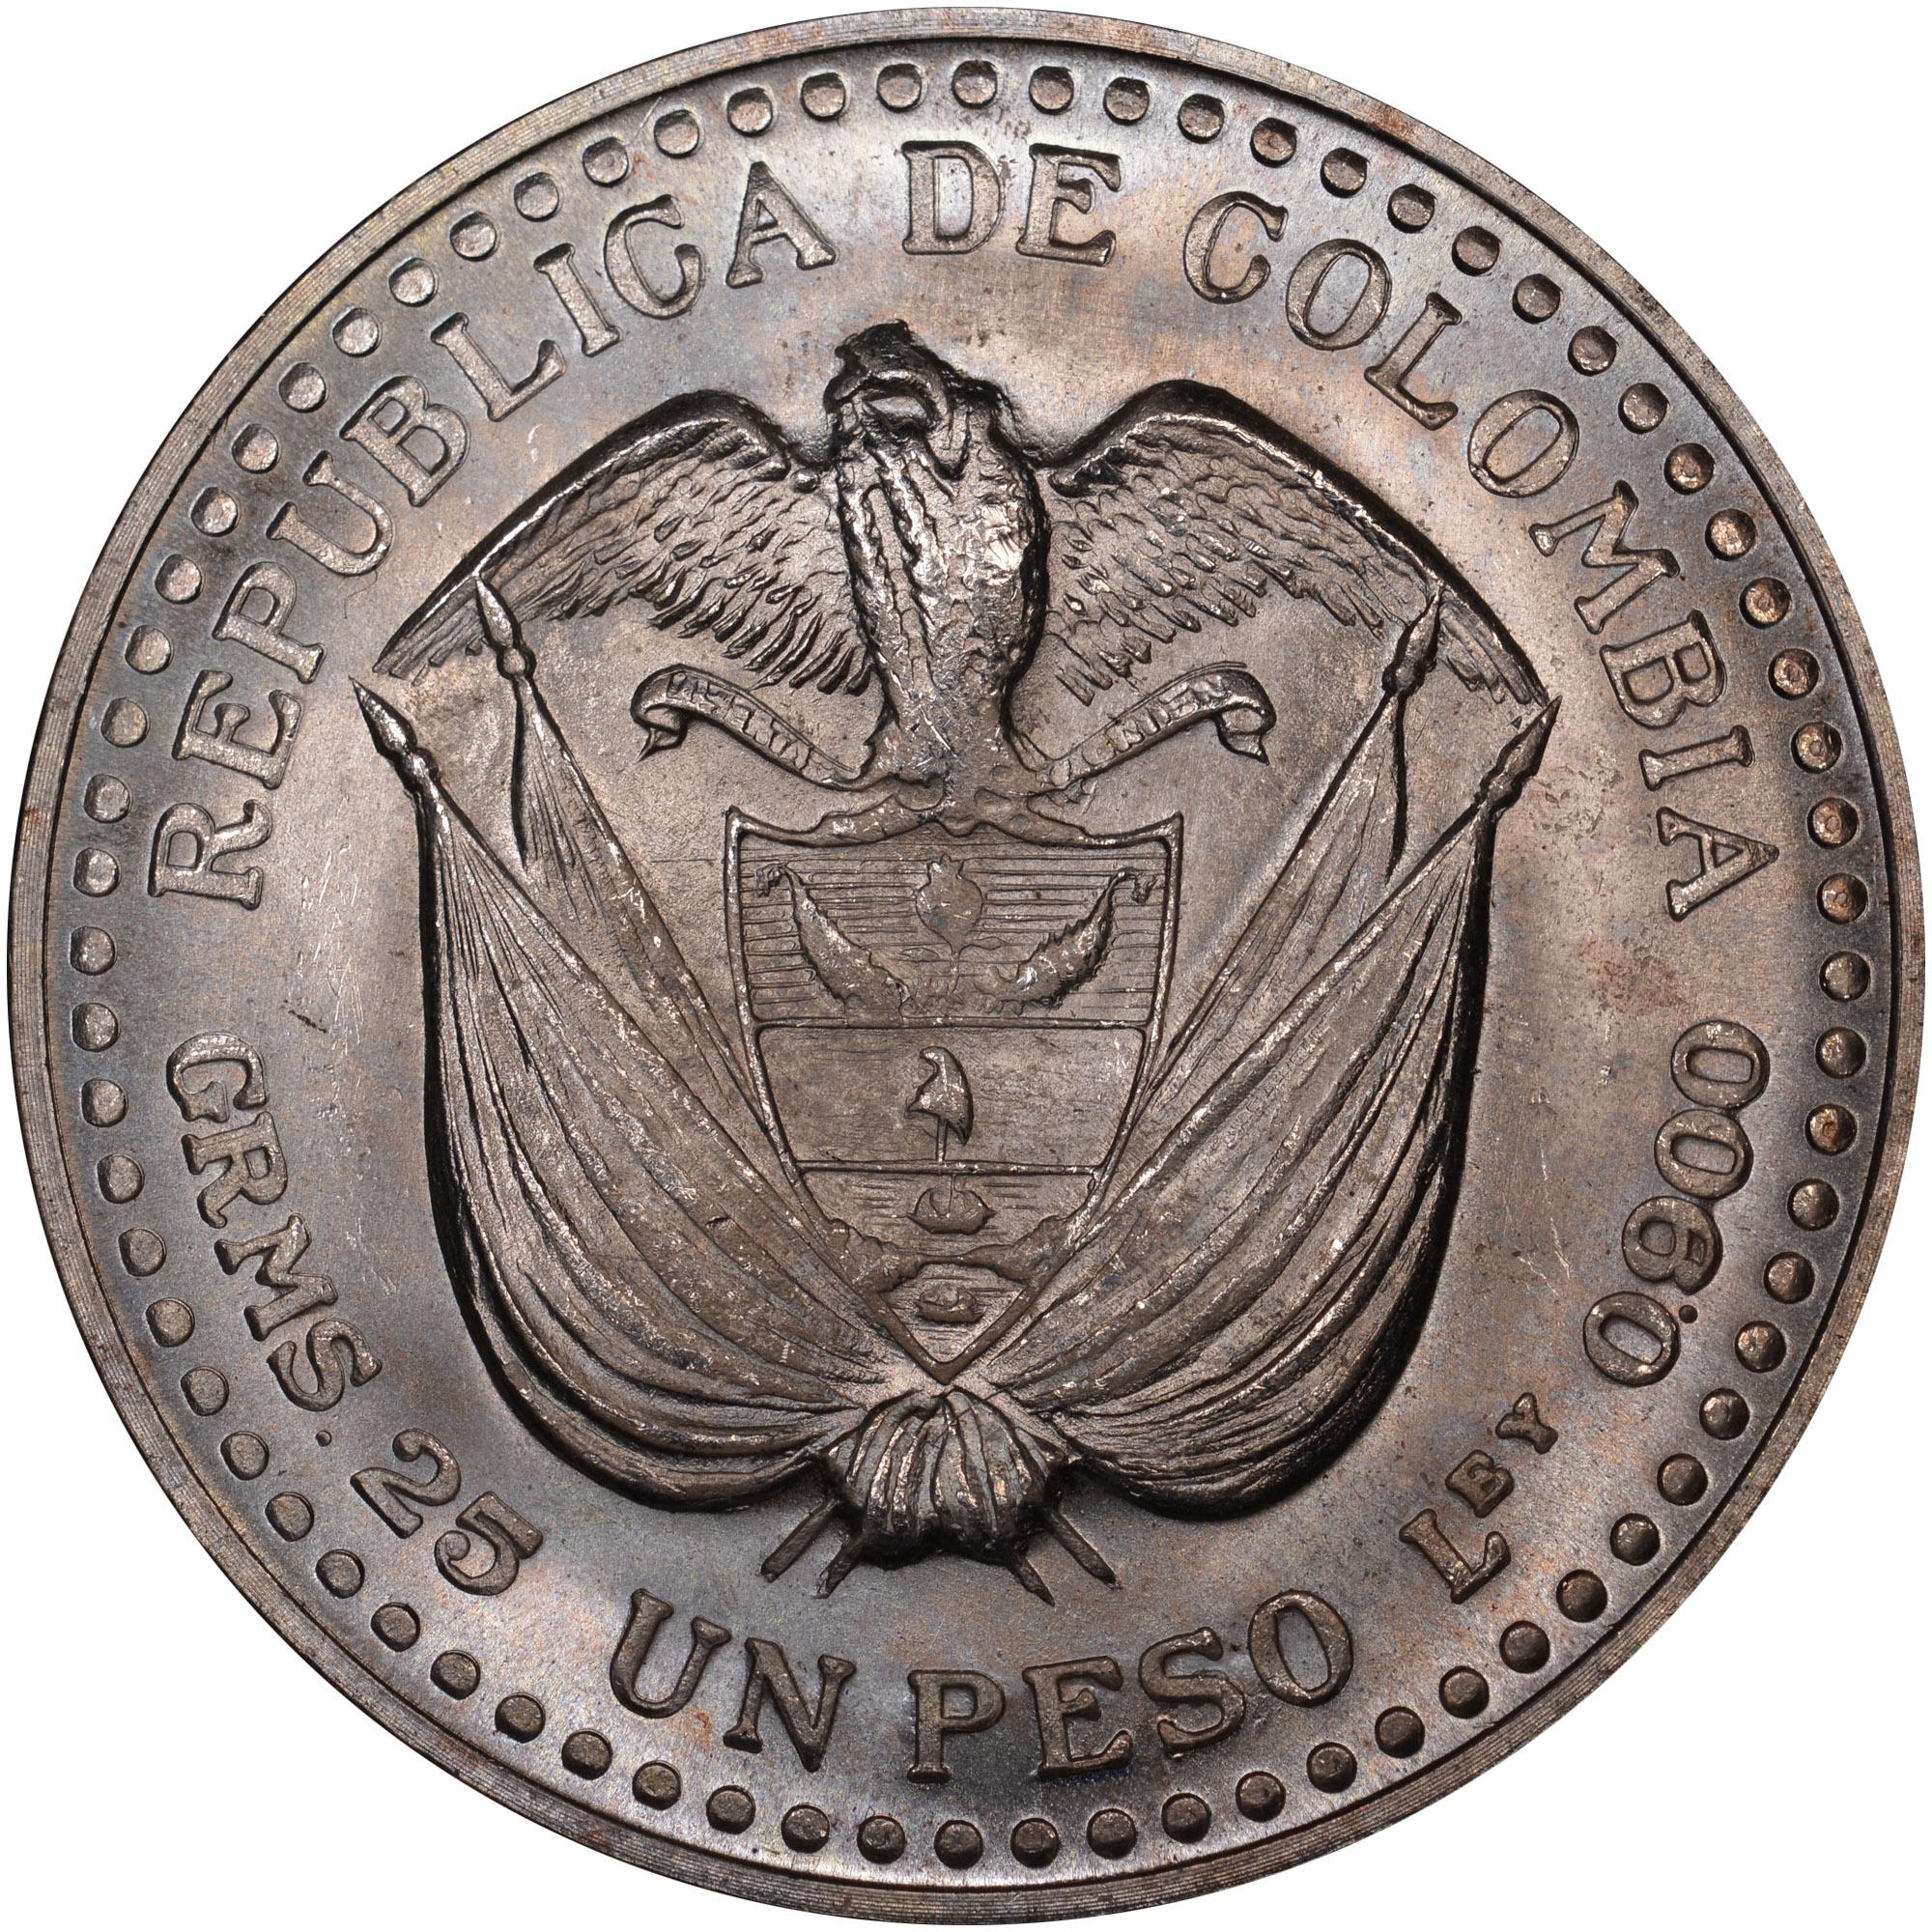 (1956) Colombia Peso obverse